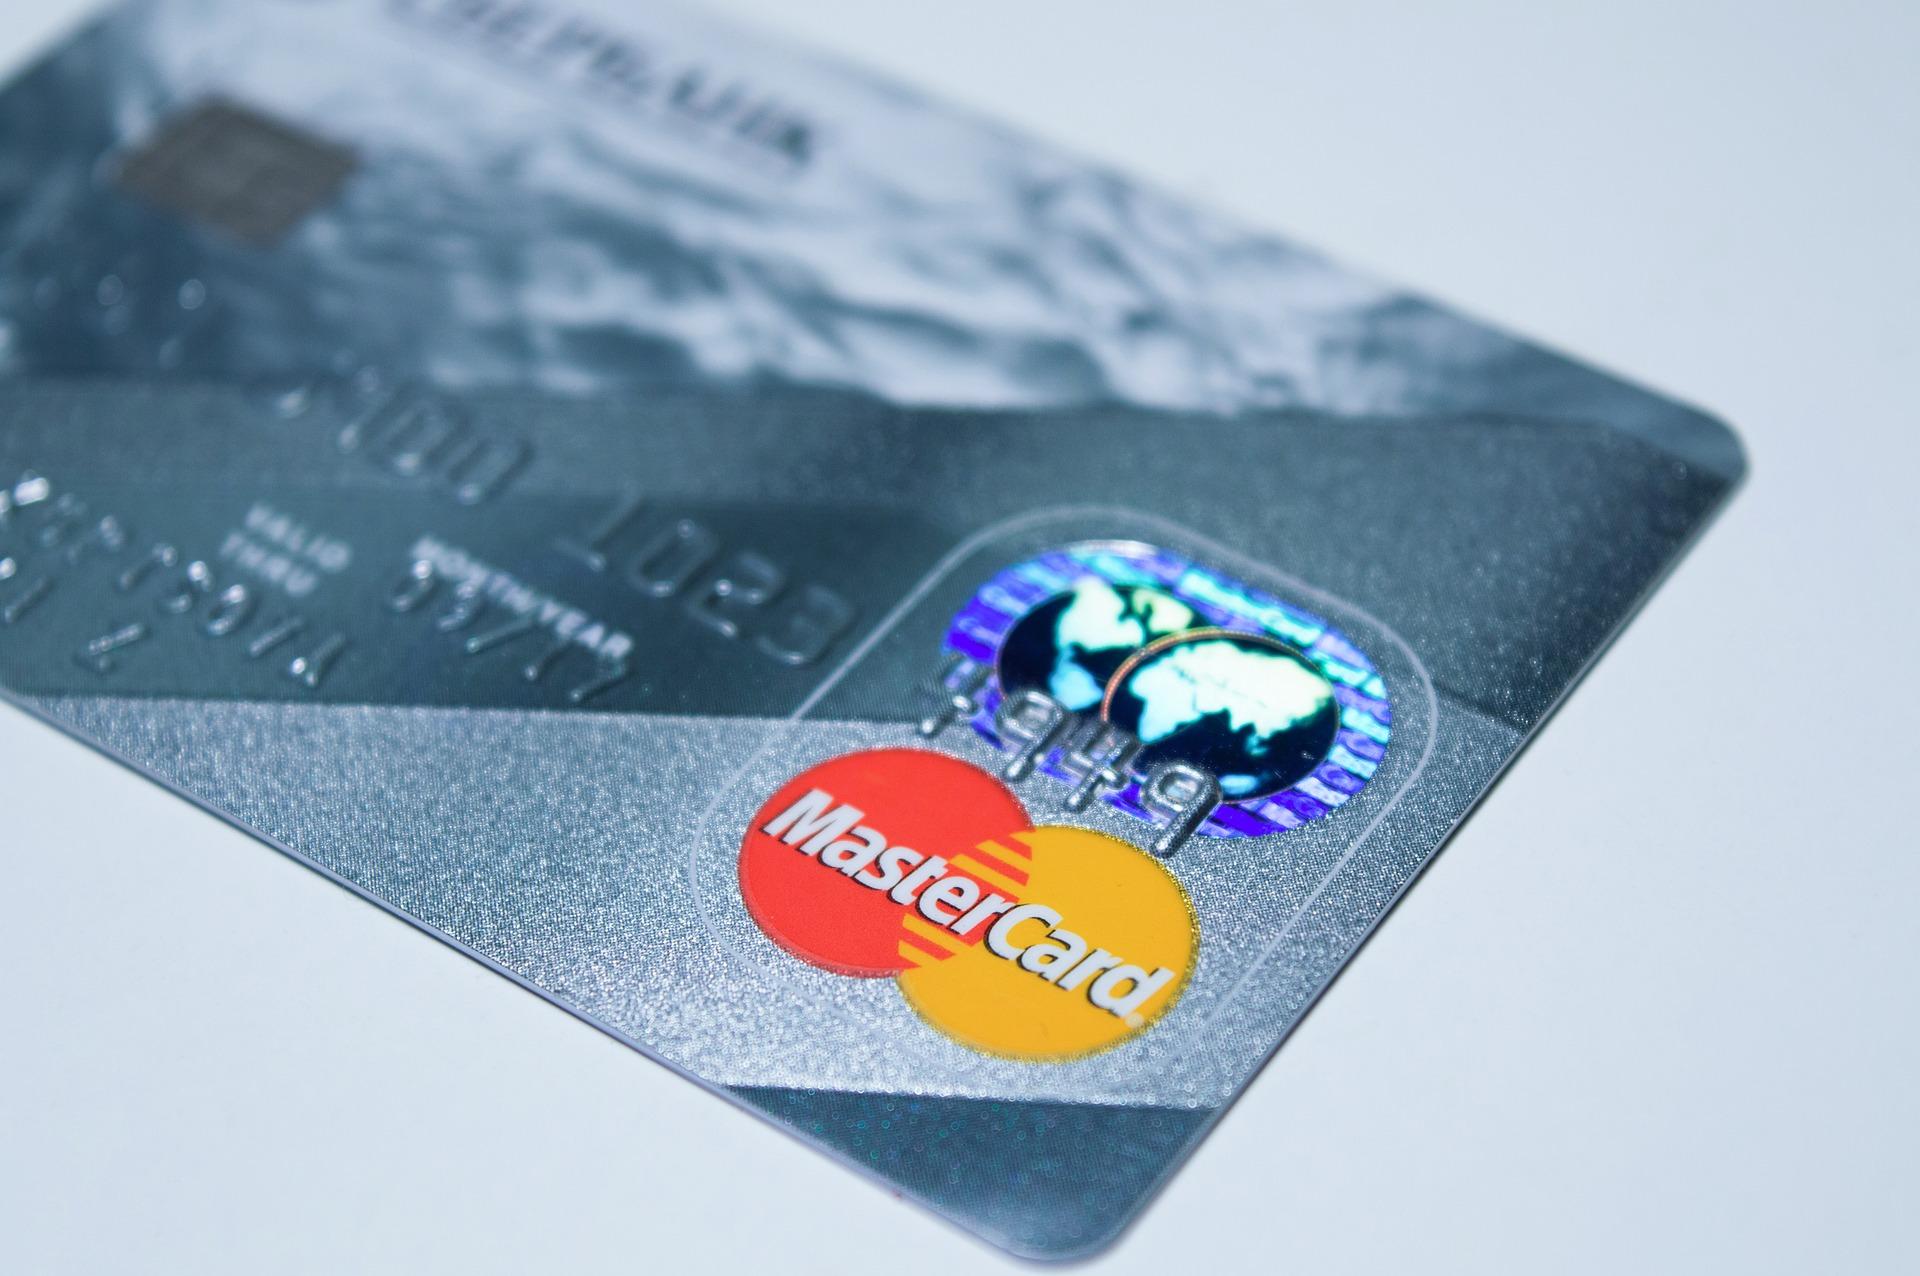 Mastercard stock, MA stock, master card stock